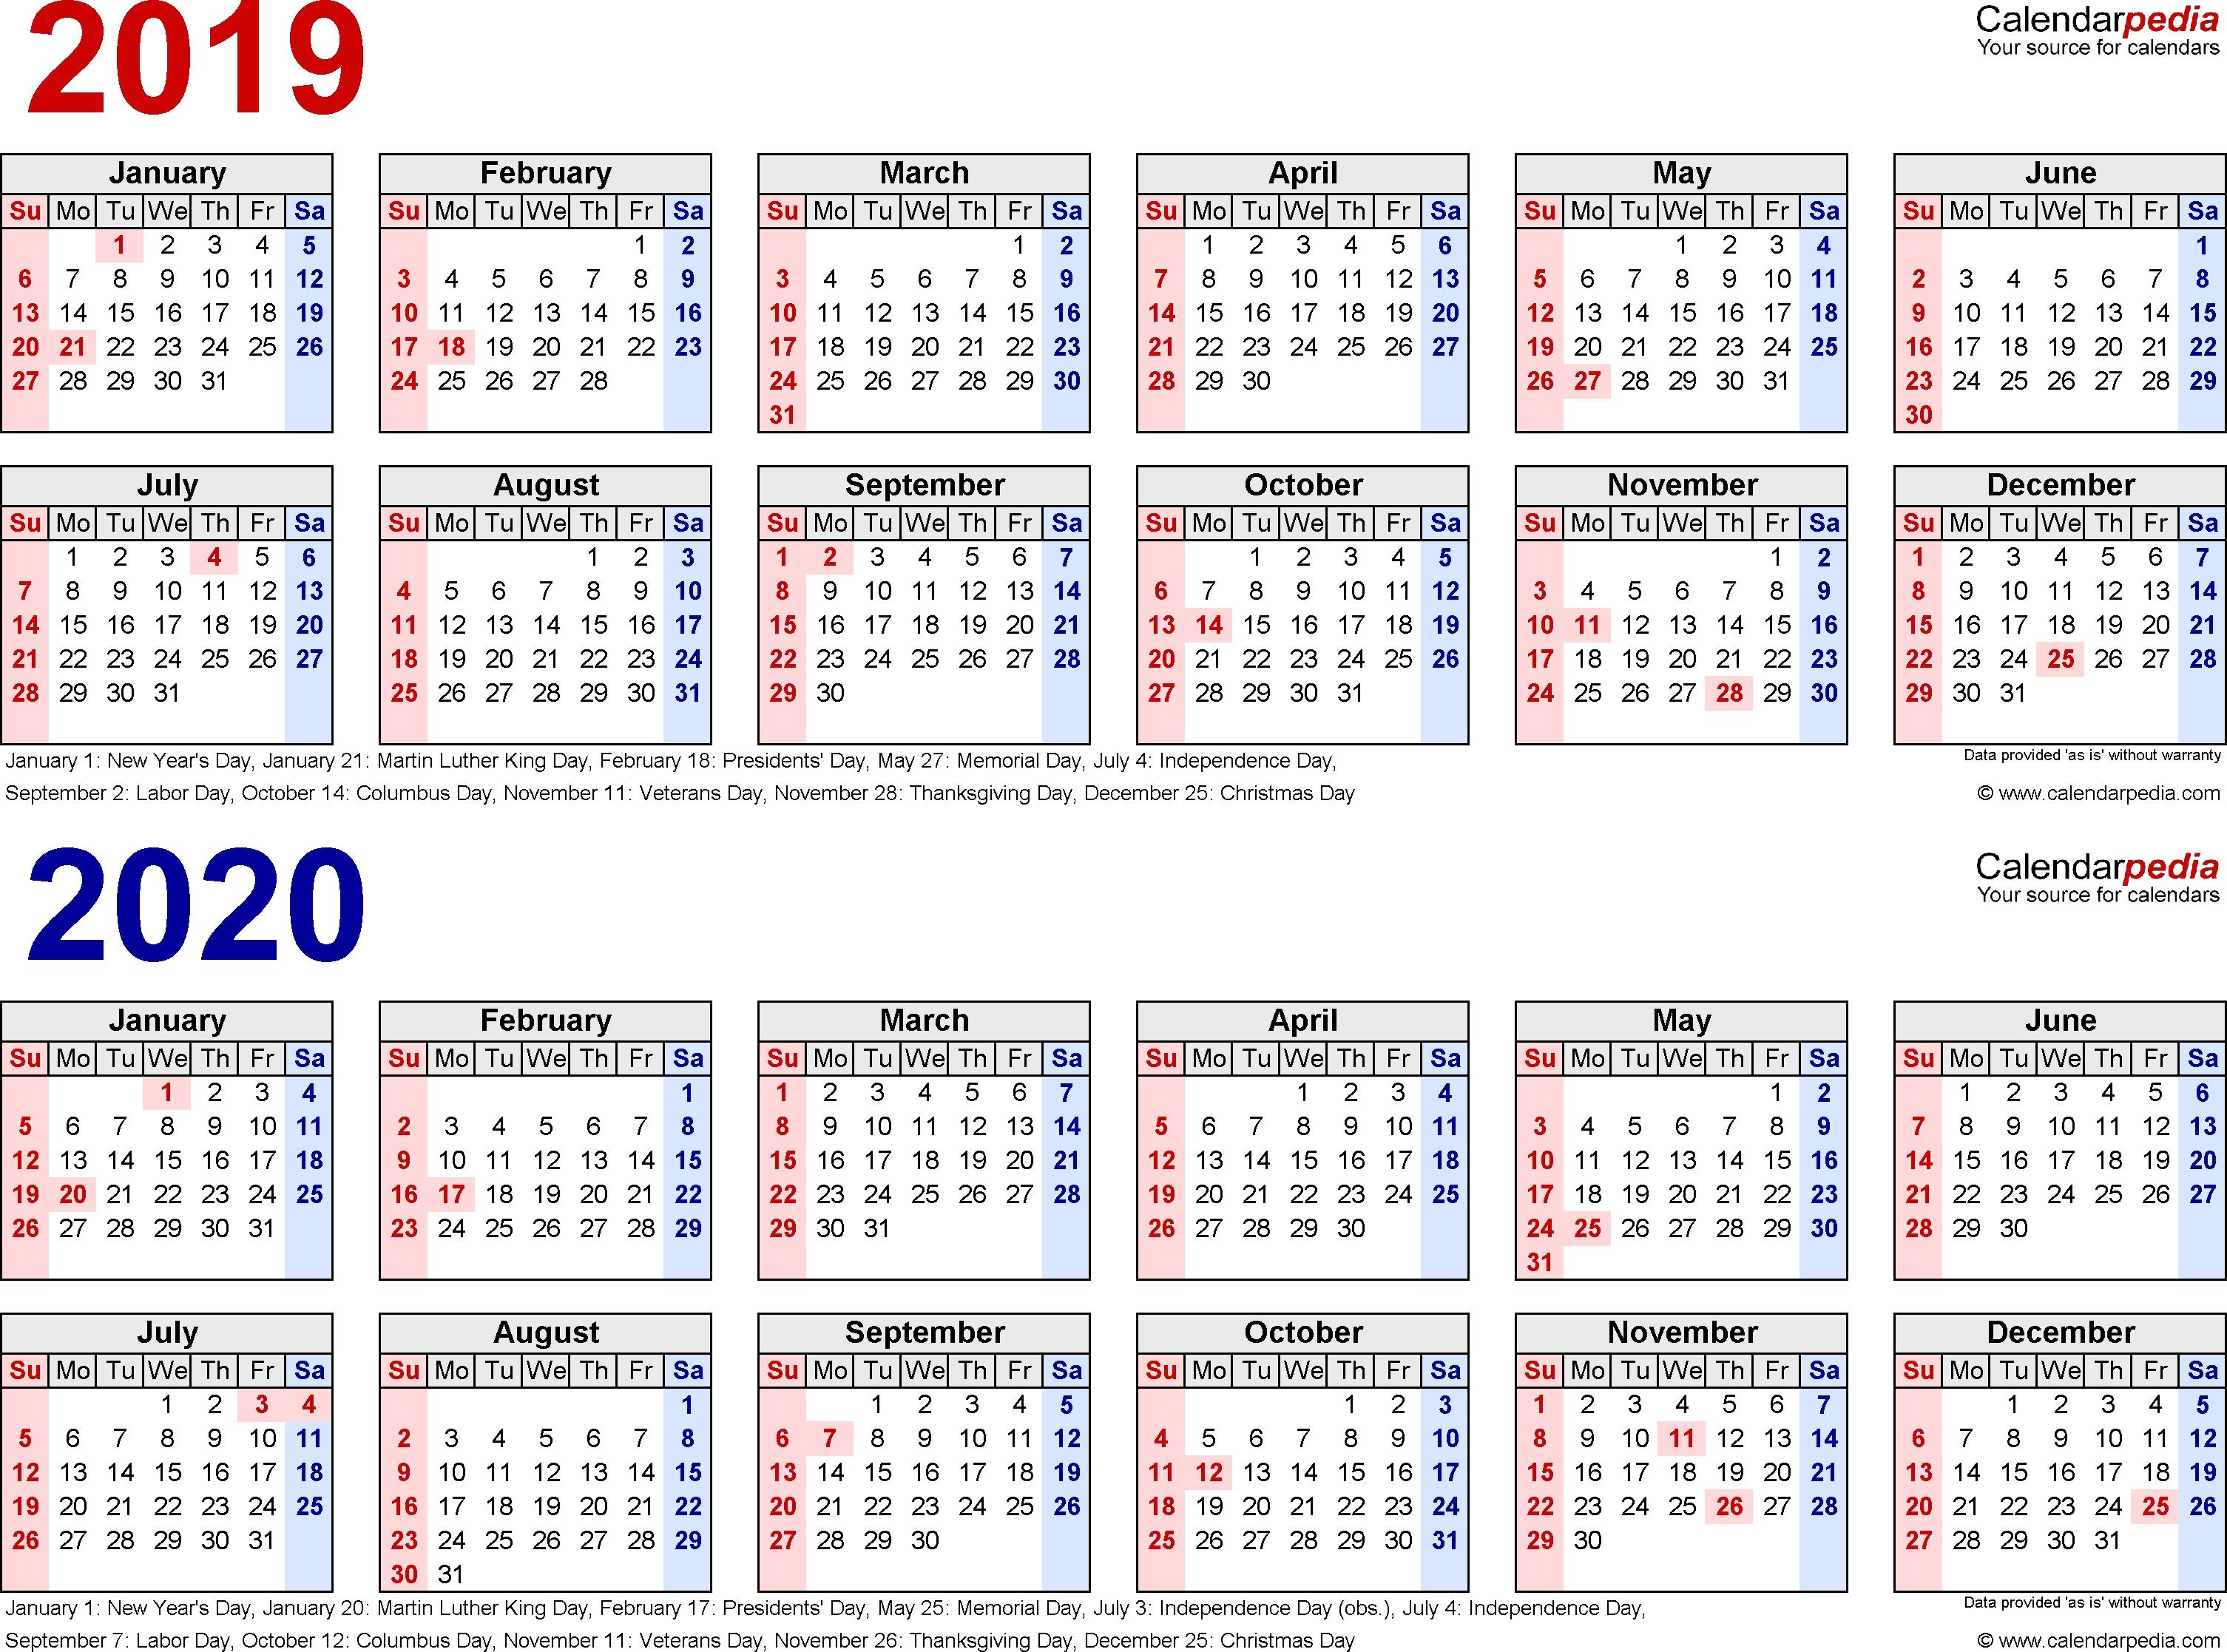 Philippines Holidays 2020 Calendar   Calendar Template ...